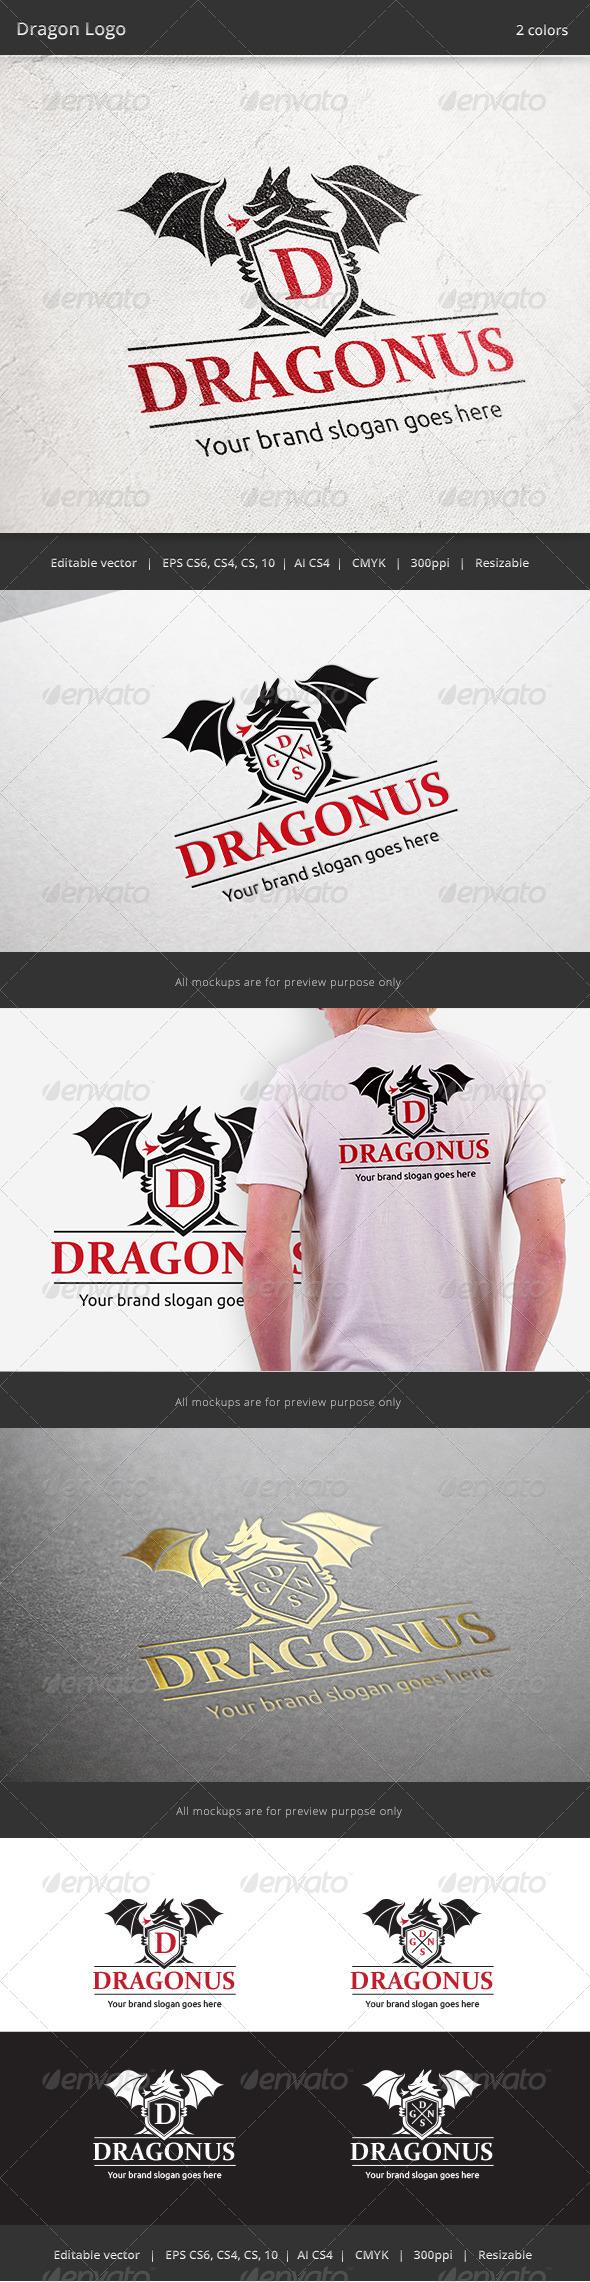 Dragon Letter V4 Logo